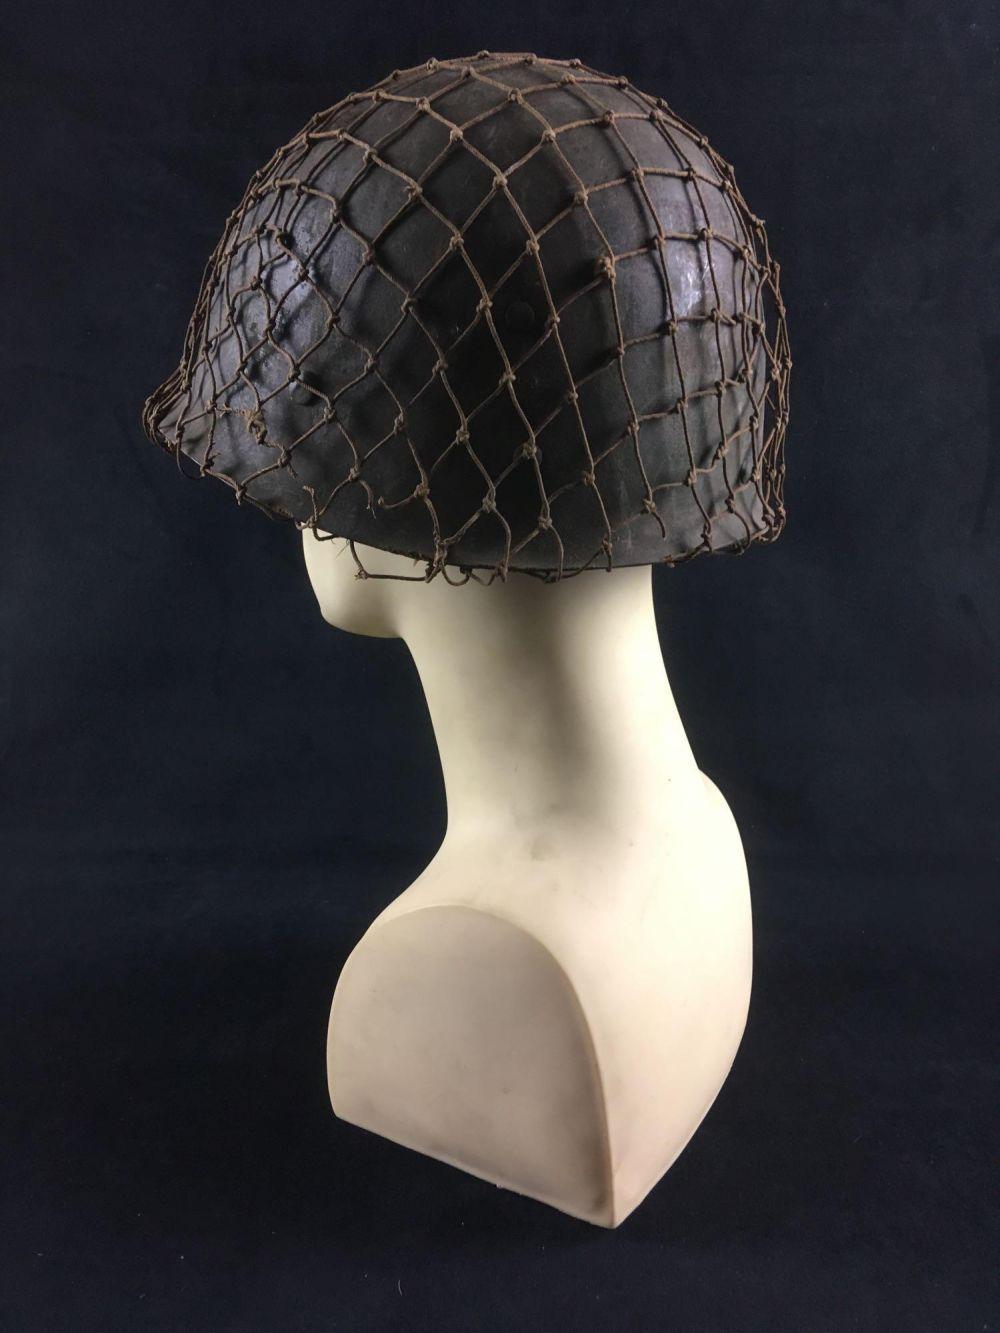 Lot 356: Military Memorabilia US Army M 1 Helmet Liner by CAPAC